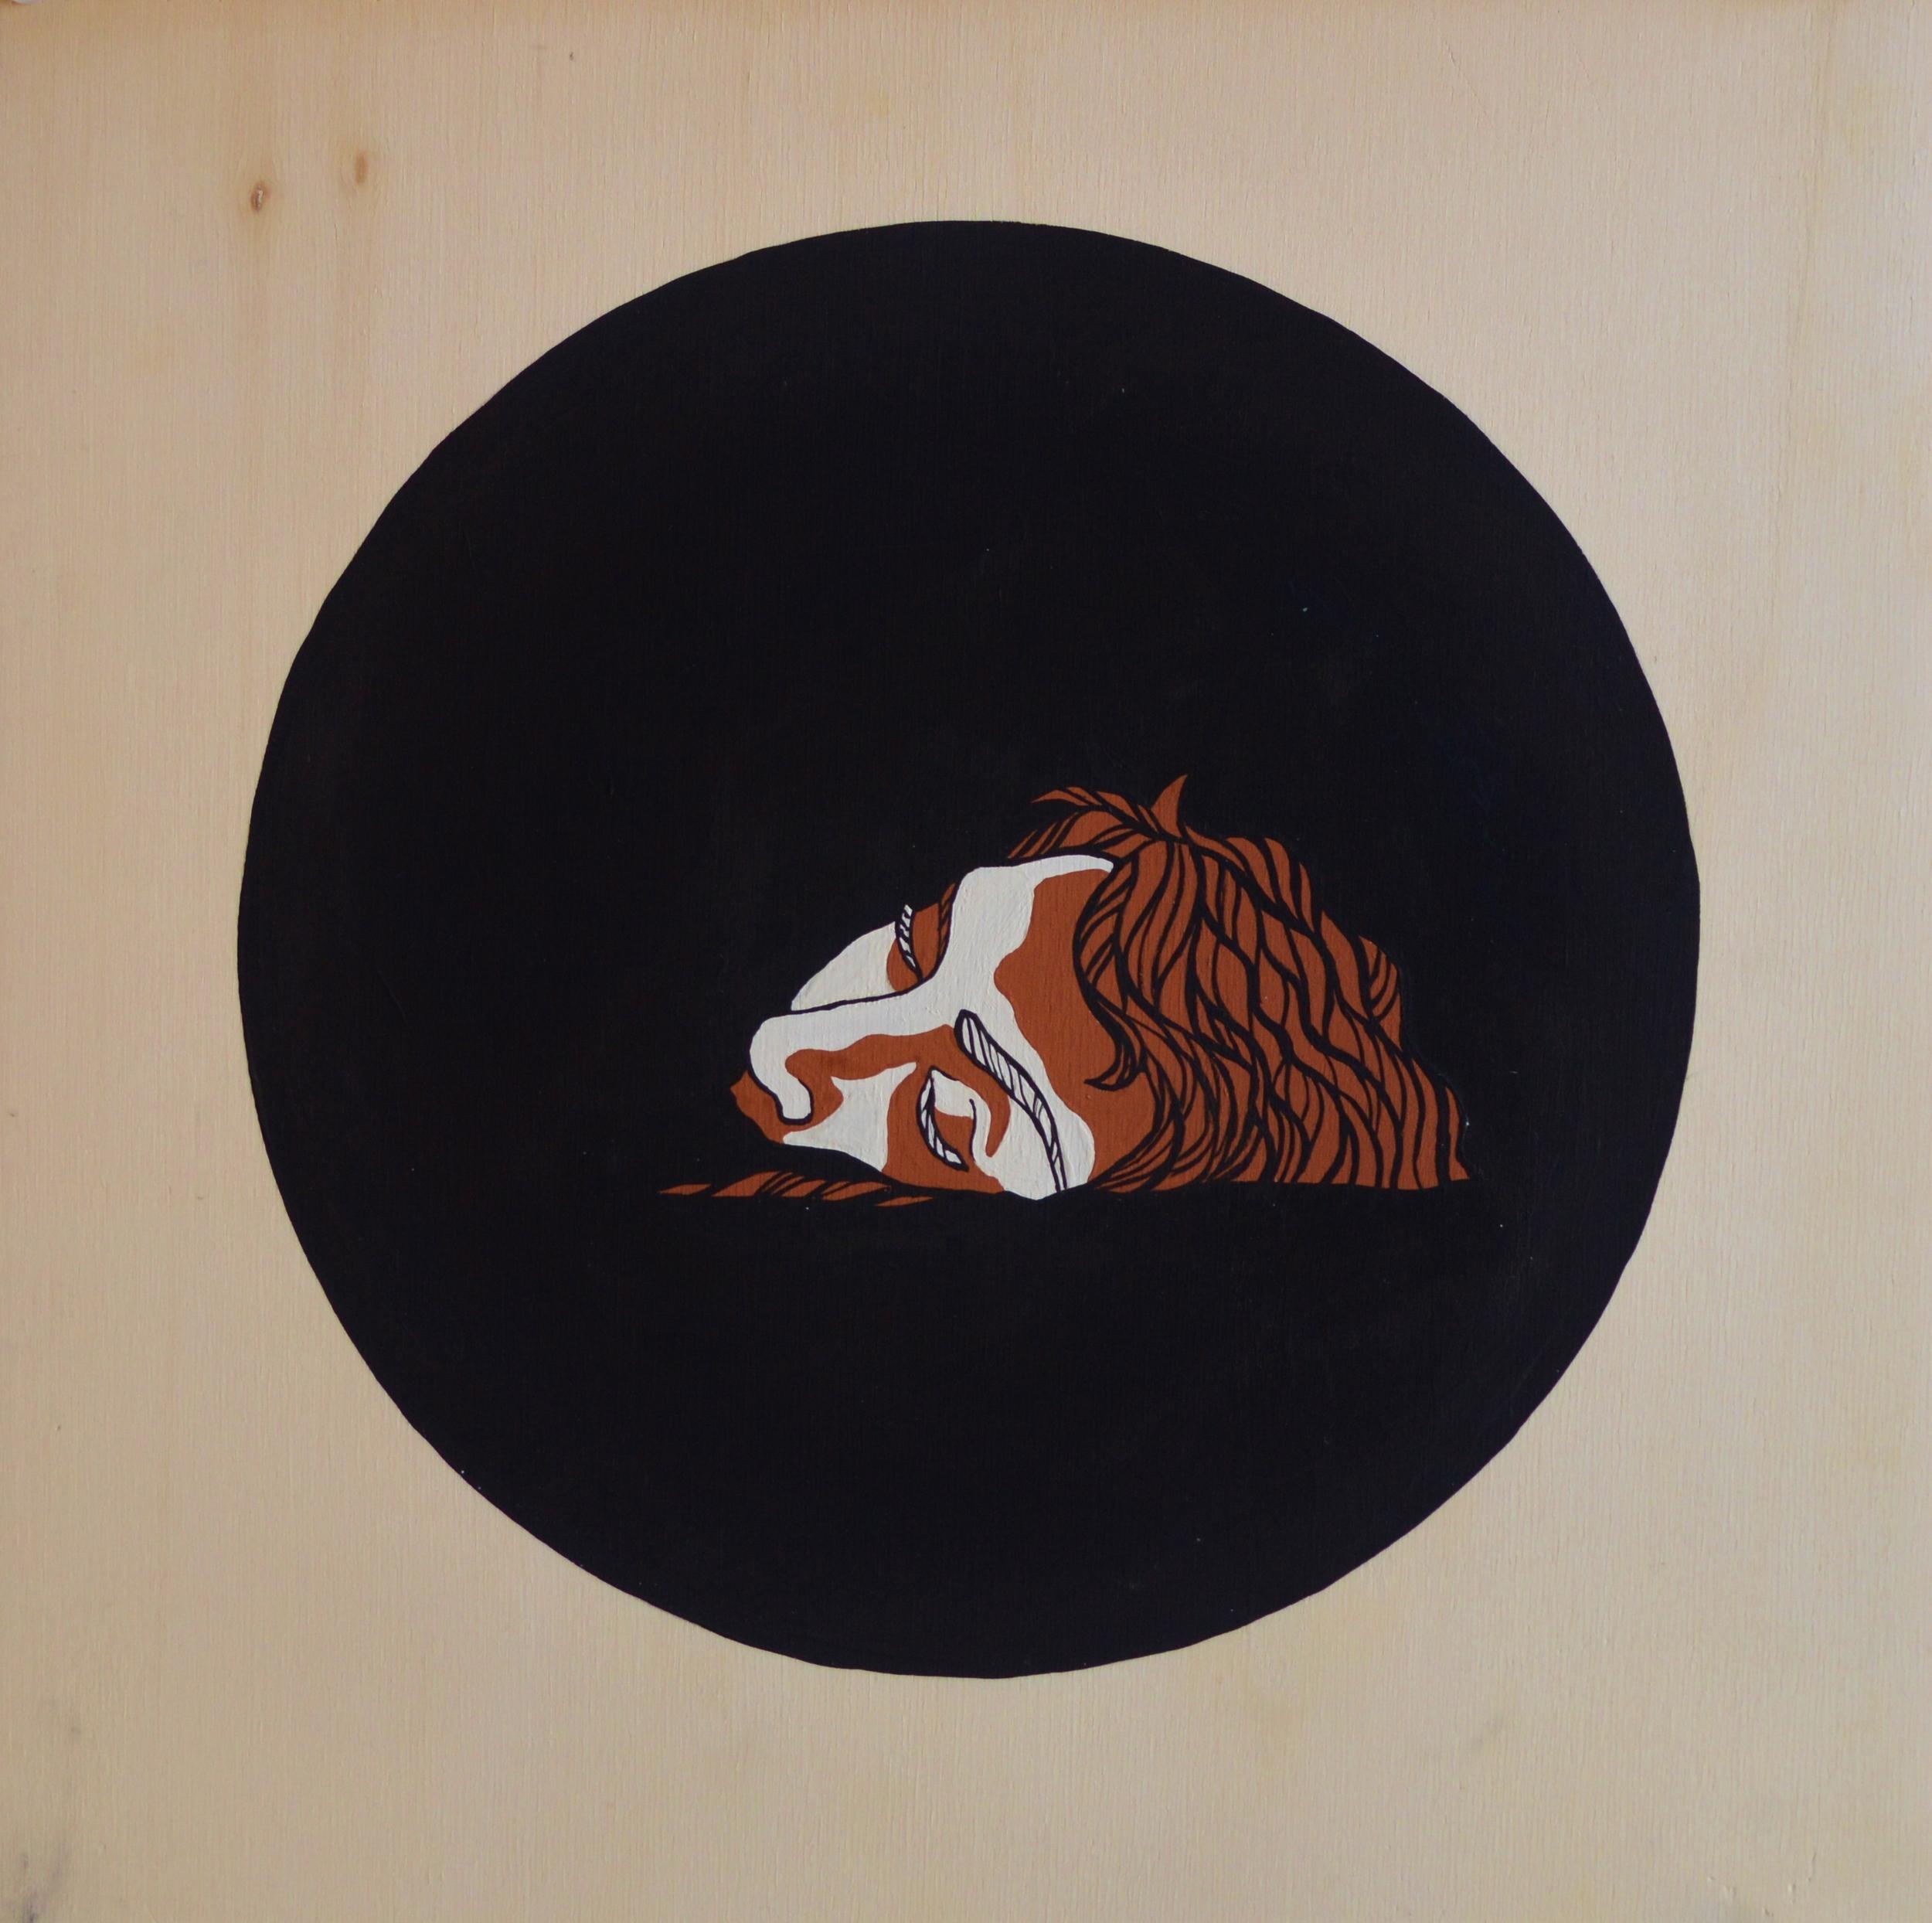 Etruscan , 30 x 30 cm, gouache on wood, 2013